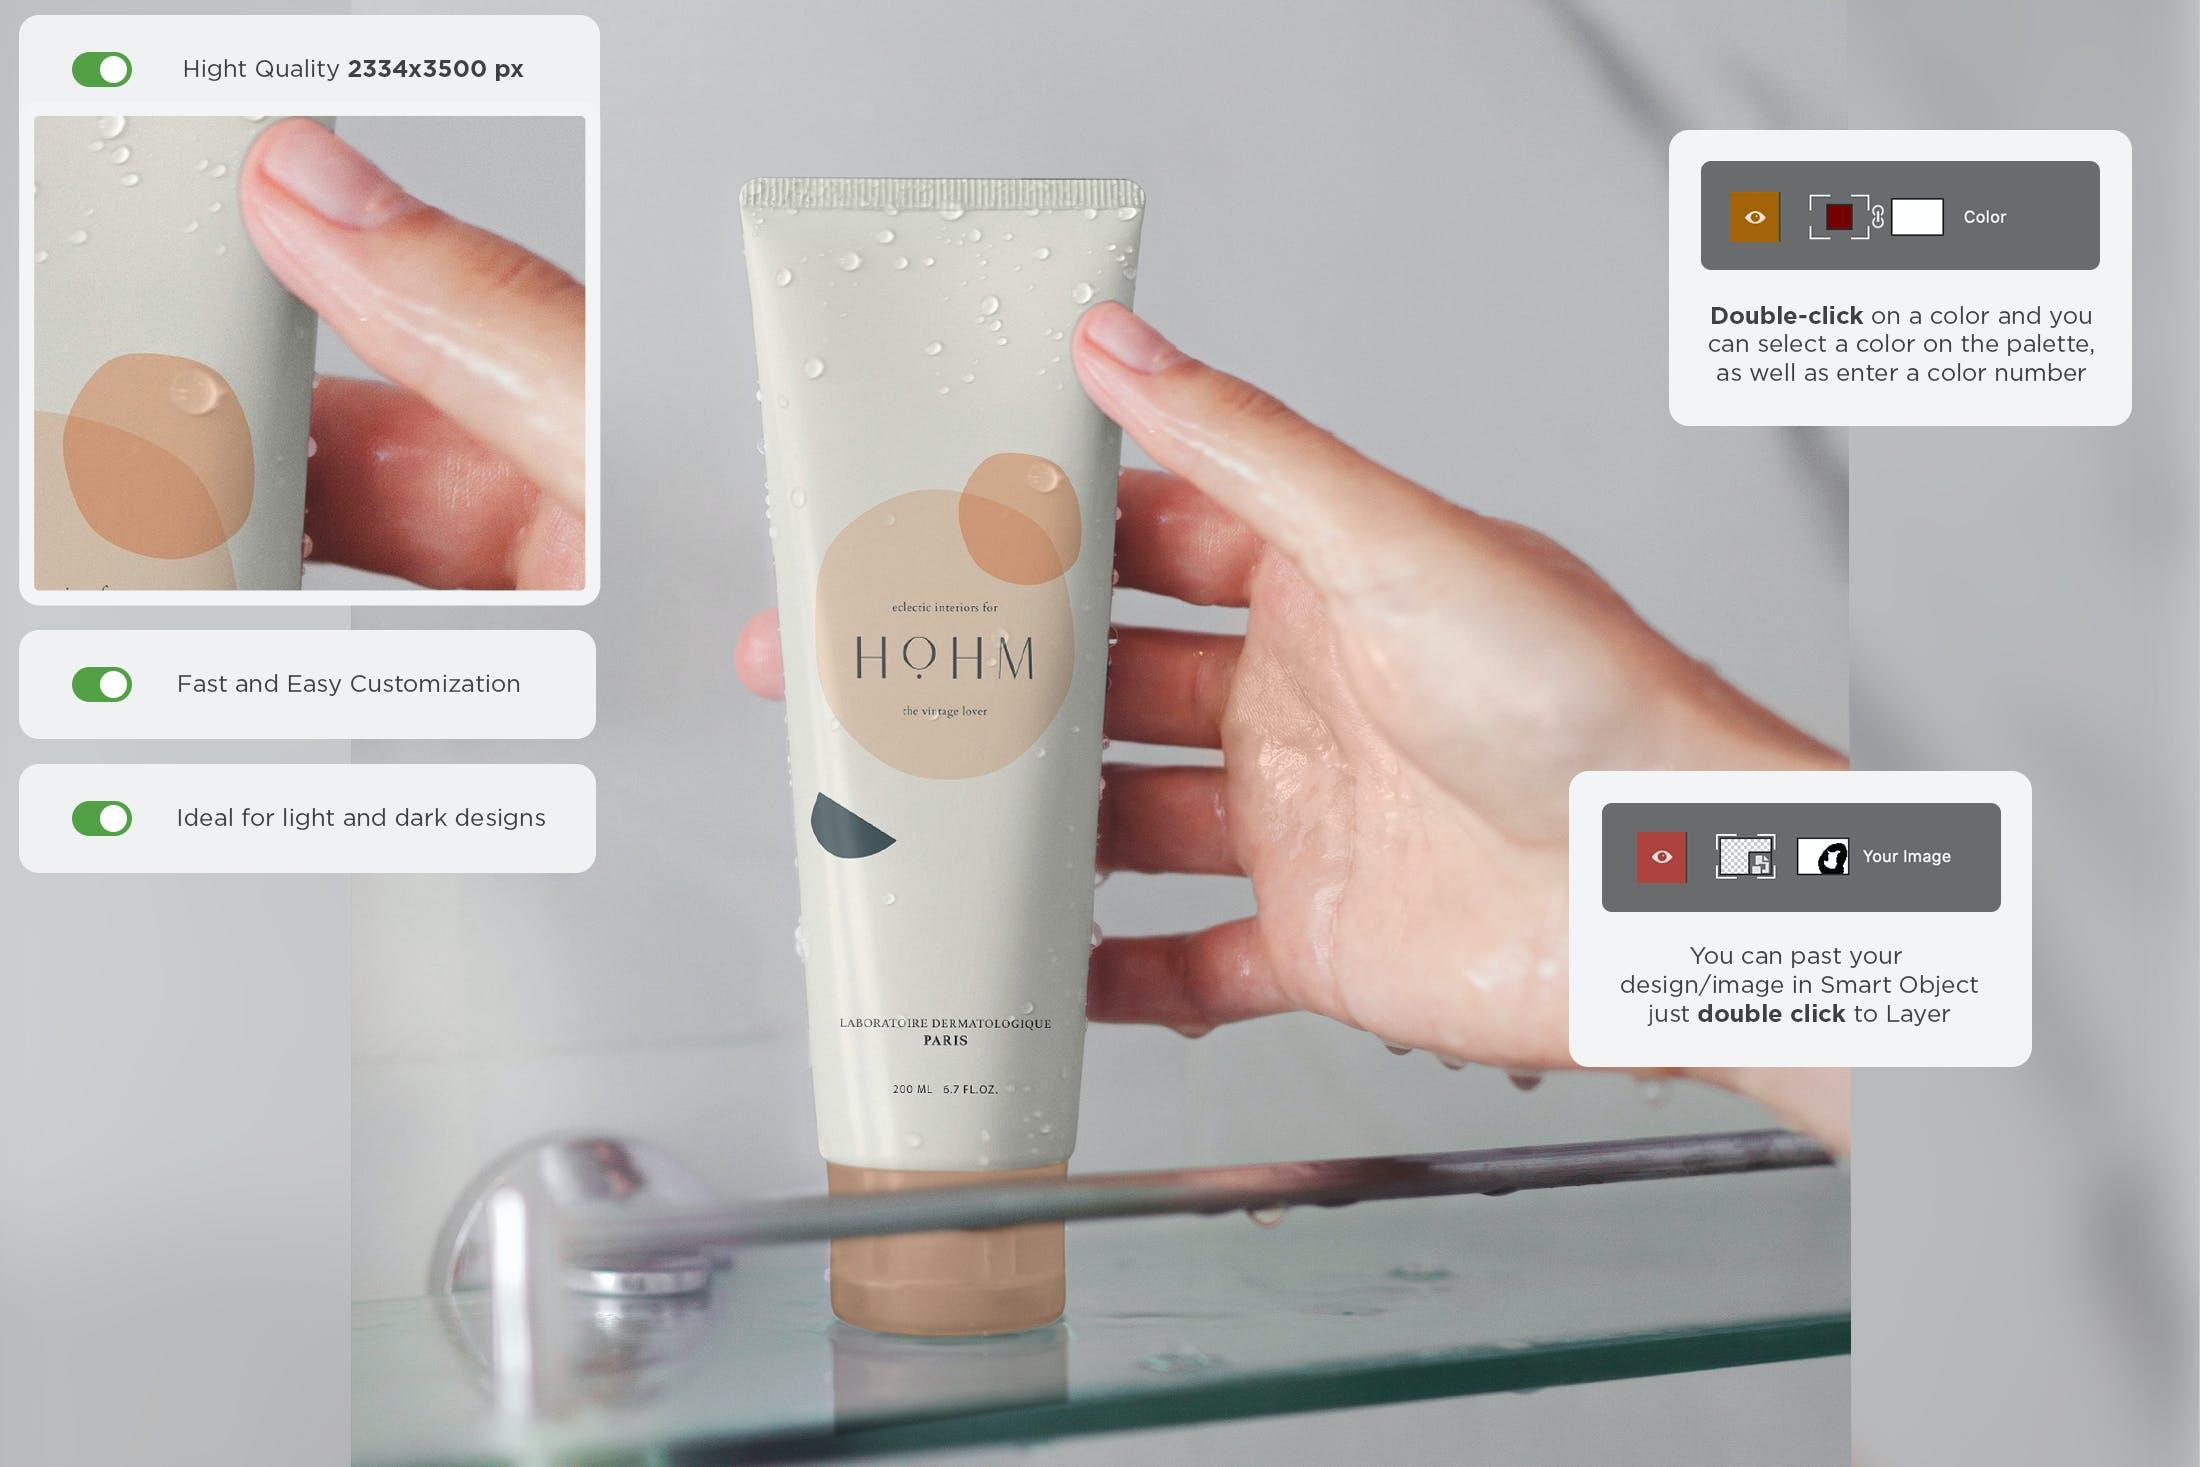 6款化妆品护手霜洗面奶包装样机模板 Cosmetic Mockup Cream Tube Bathroom插图(1)